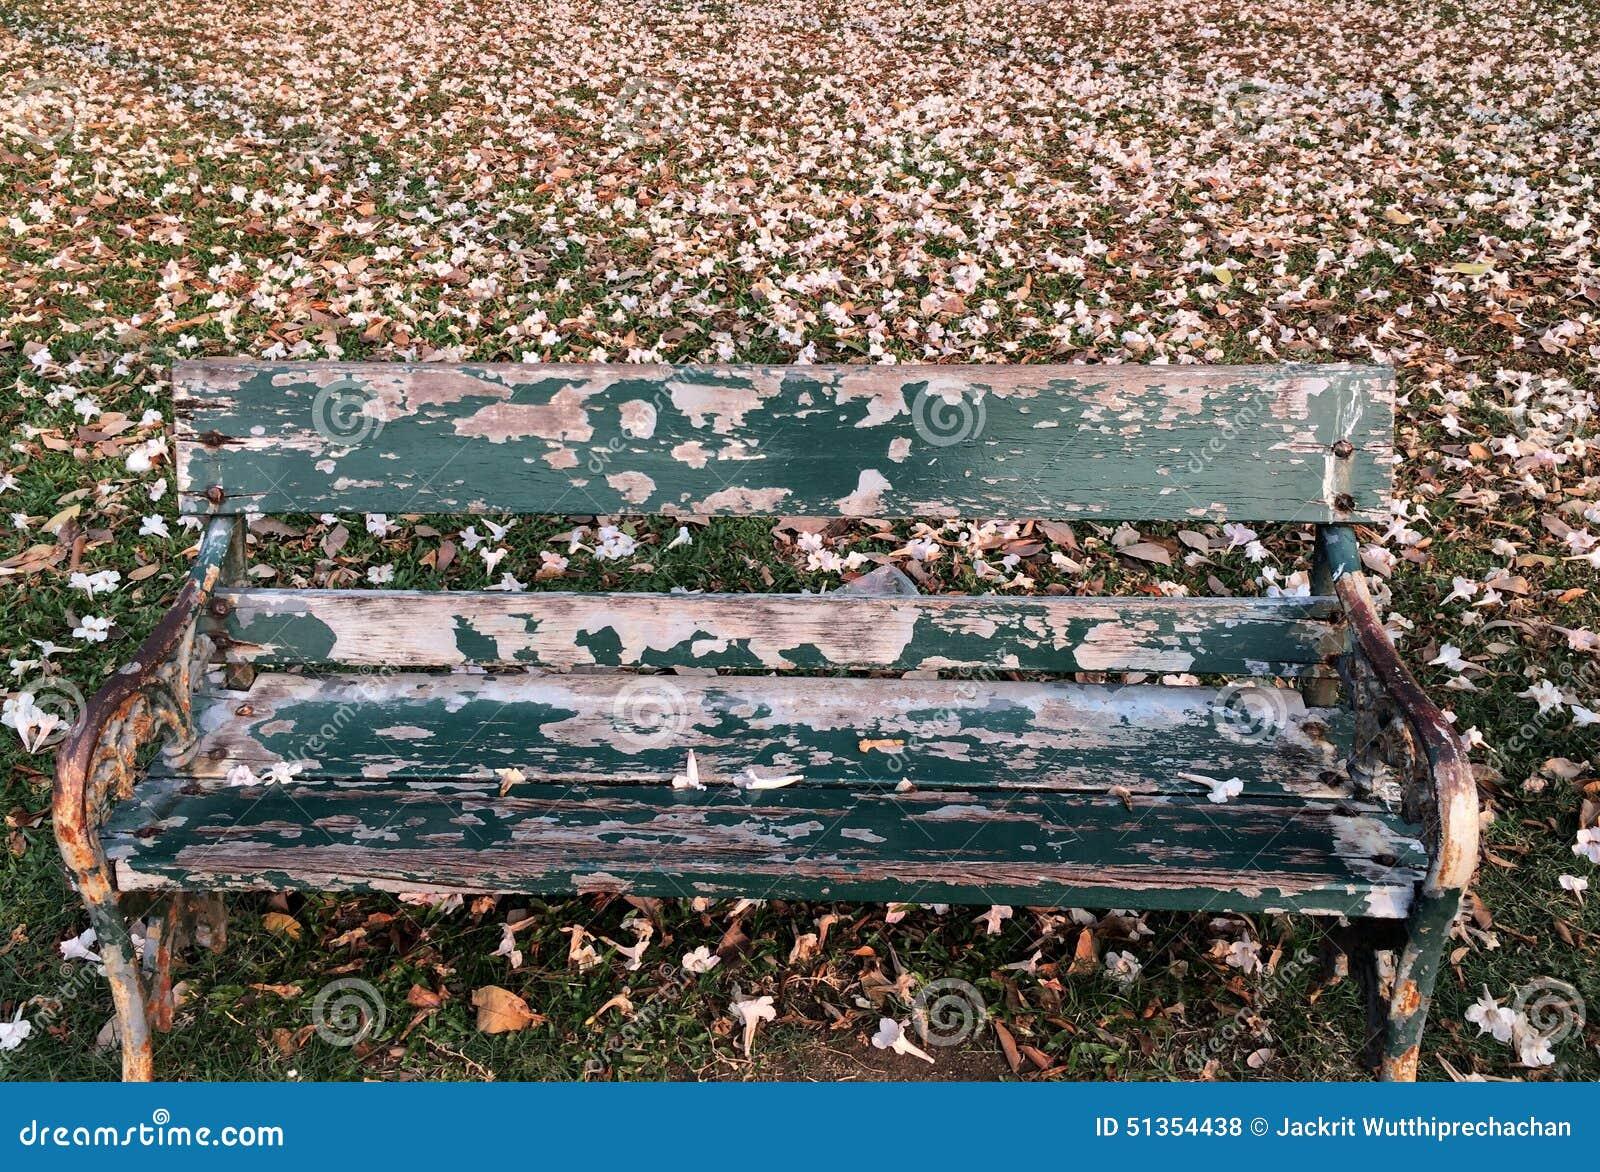 Sedia Pantone Rosa : La vecchia singola sedia lunga con goccia rosa dei fiori ha